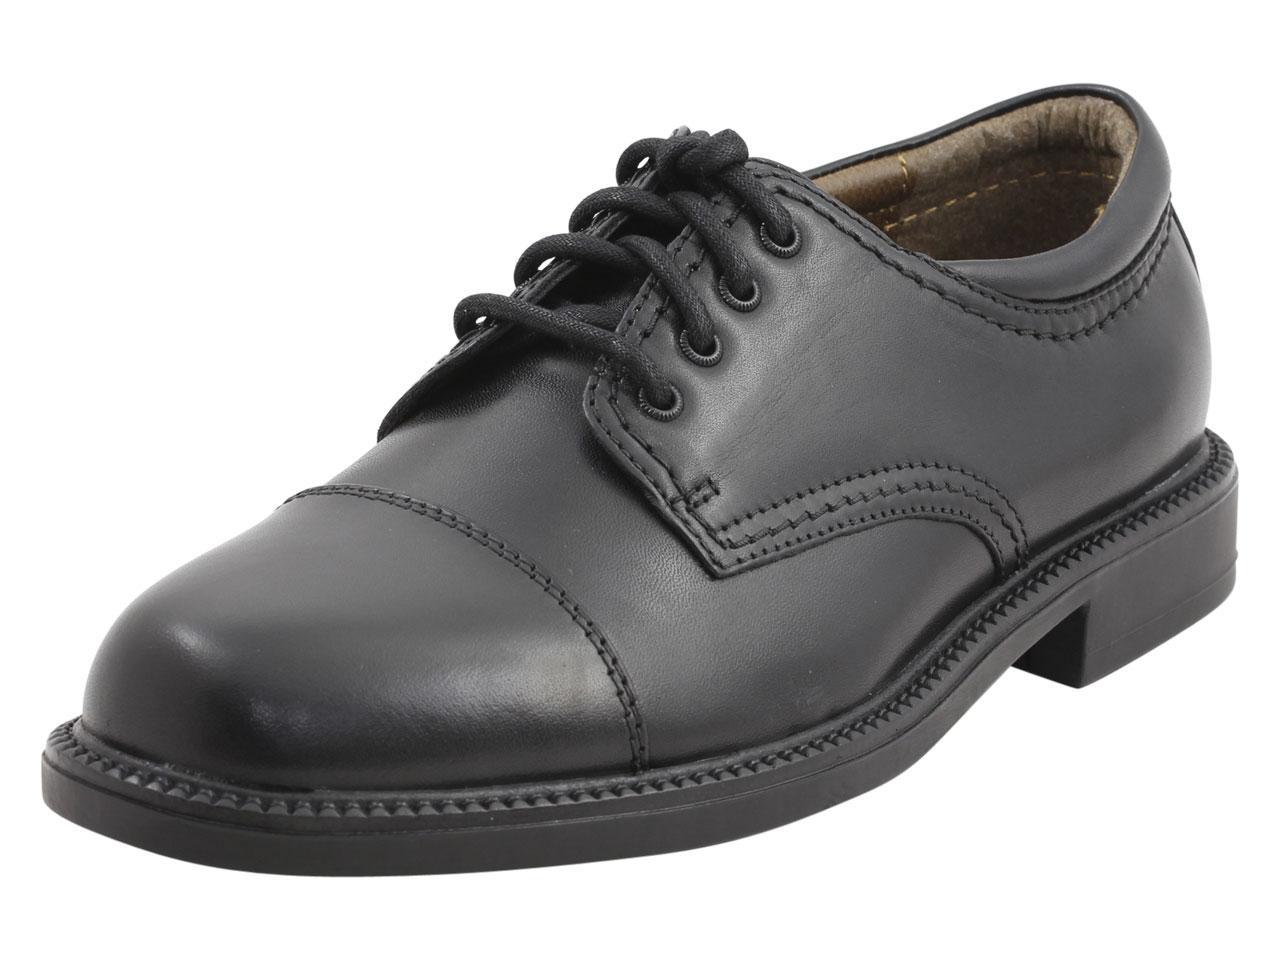 Image of Dockers Men's Gordon Cap Toe Oxfords Shoes - Black - 10 E(W) US